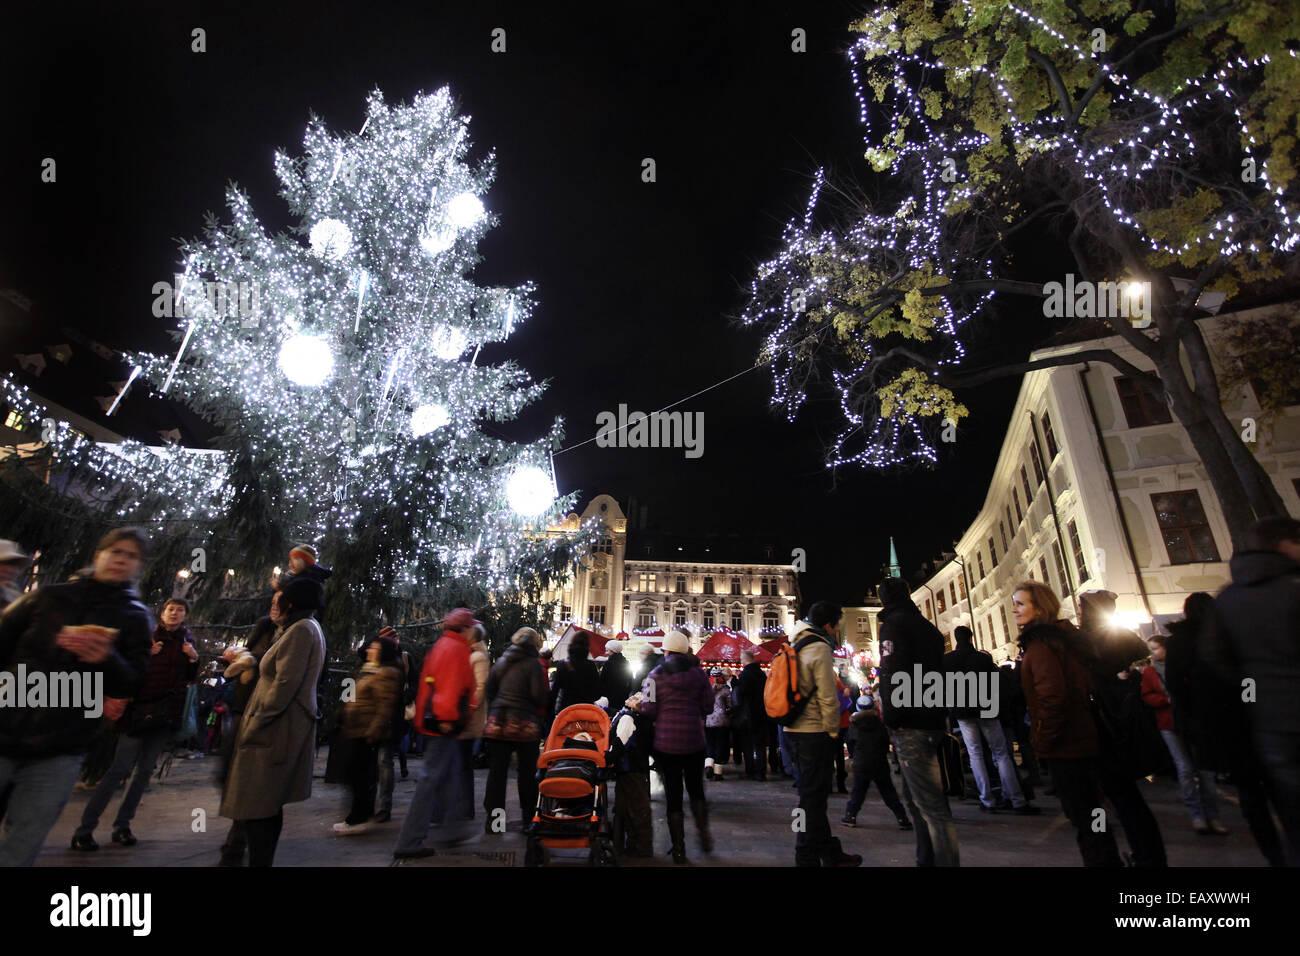 Bratislava, Slowakei. 21. November 2014. Foto aufgenommen am 21 ...